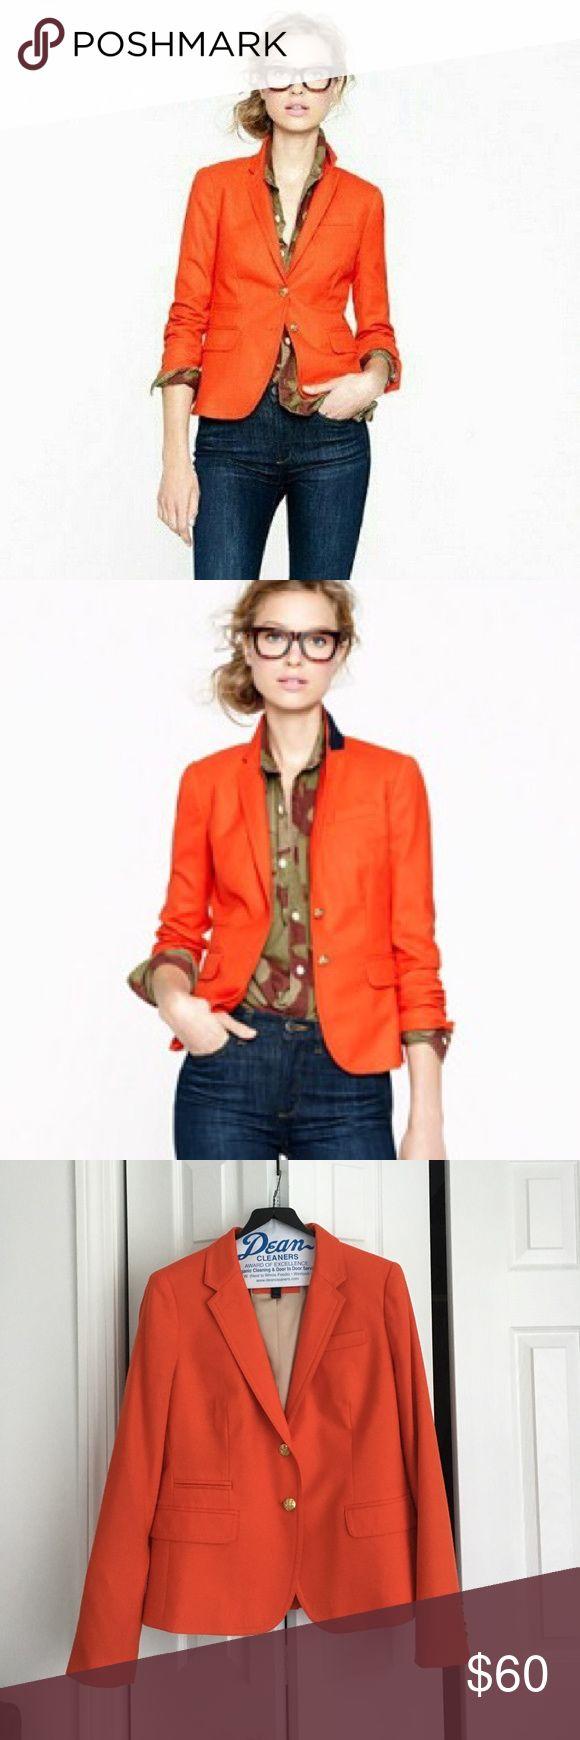 J. CREW ORANGE SCHOOLBOY BLAZER  J. Crew orange school boy blazer with gold buttons. Wool flannel material. J. Crew Jackets & Coats Blazers